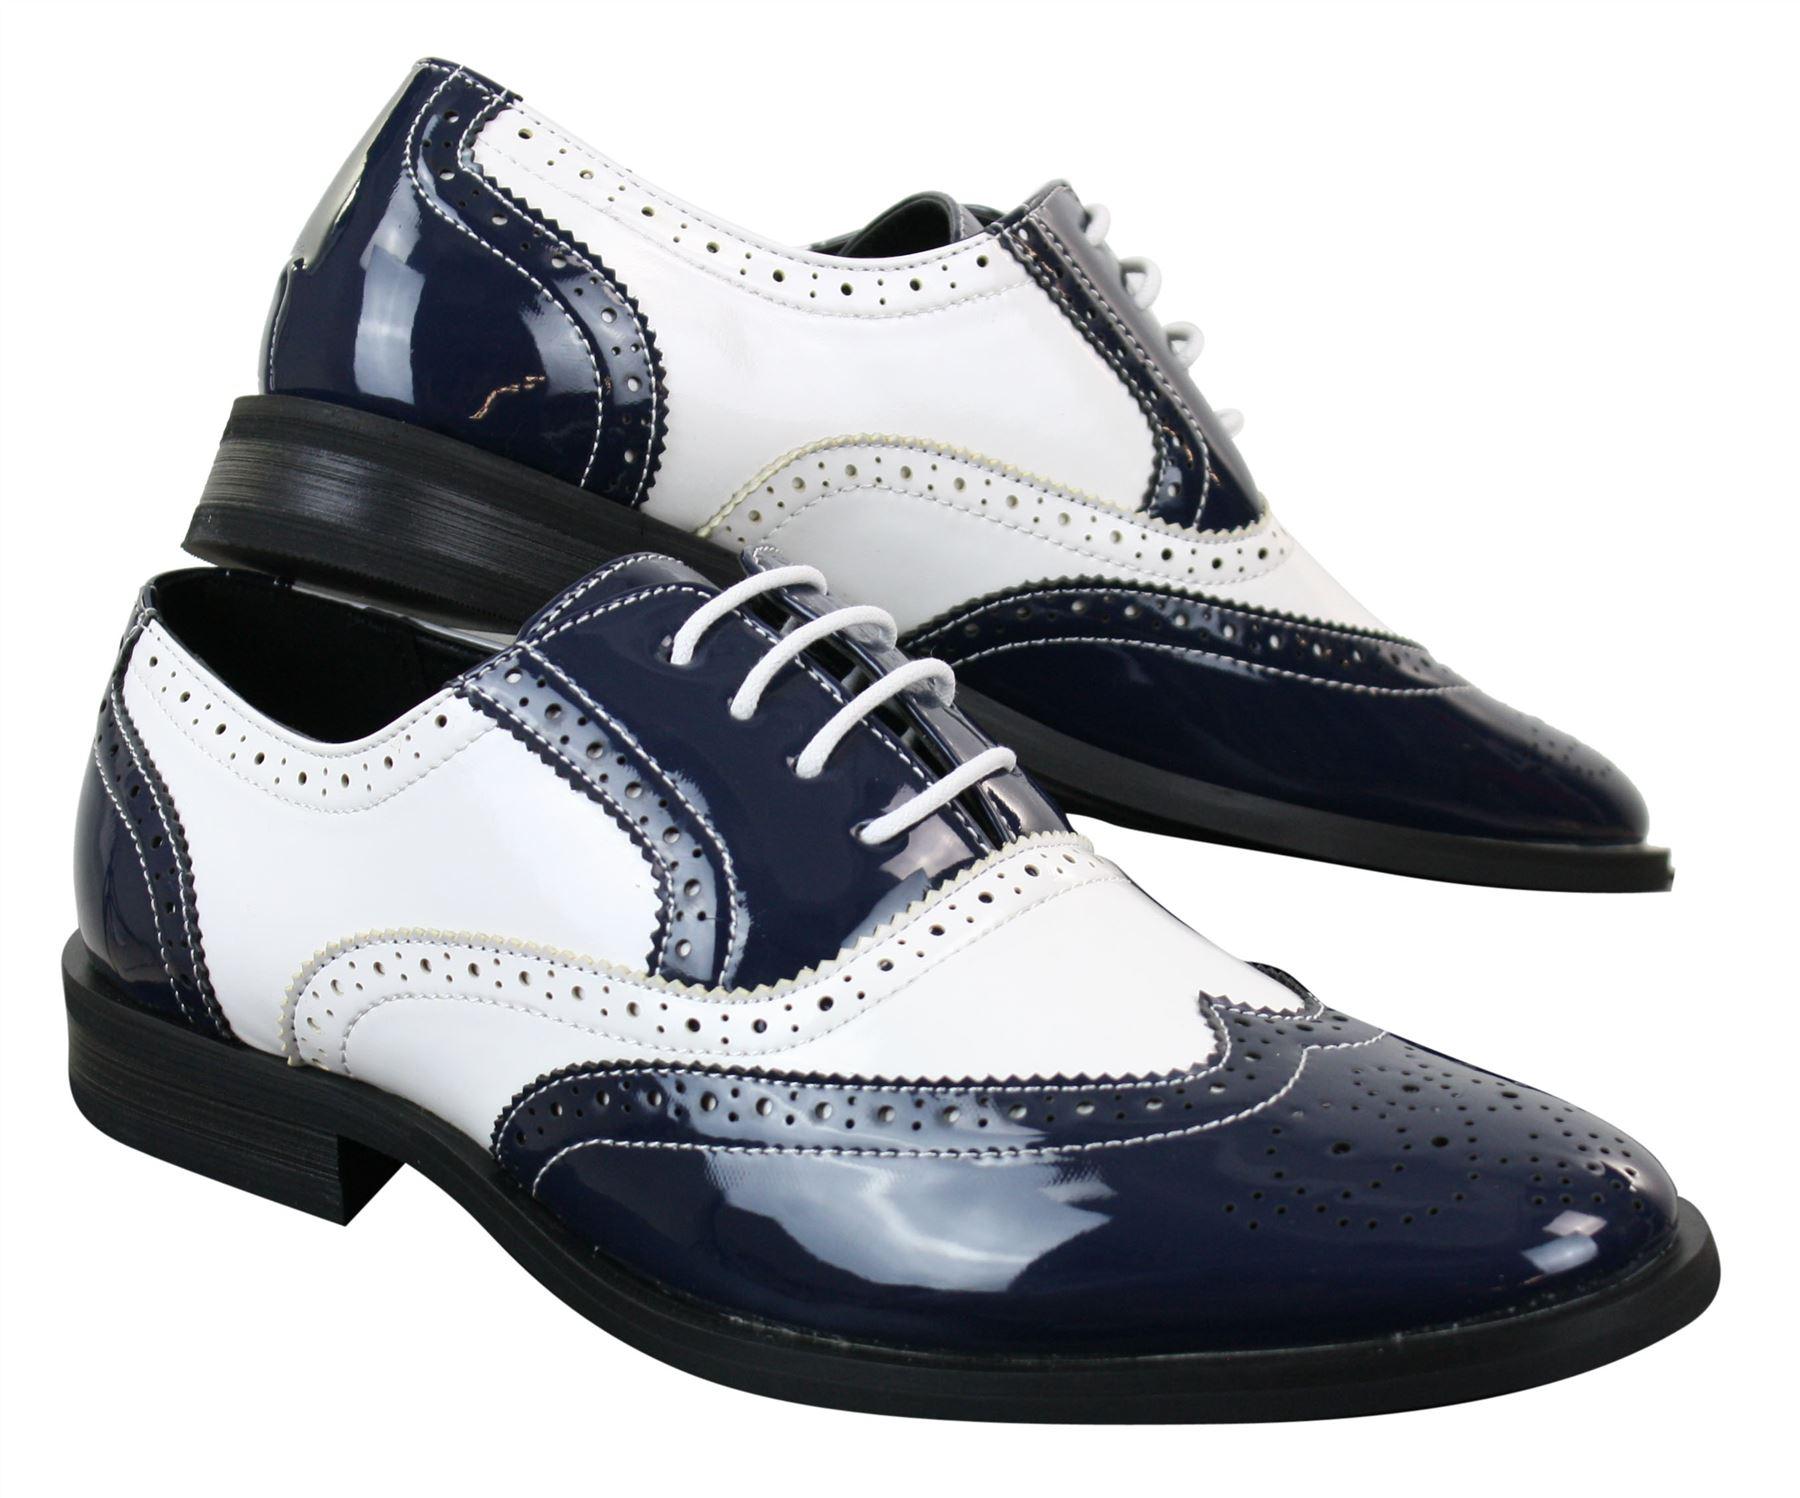 ac8faf0c07511b Chaussures homme cuir PU verni brillant brogues Gatsby 1920 noir ...